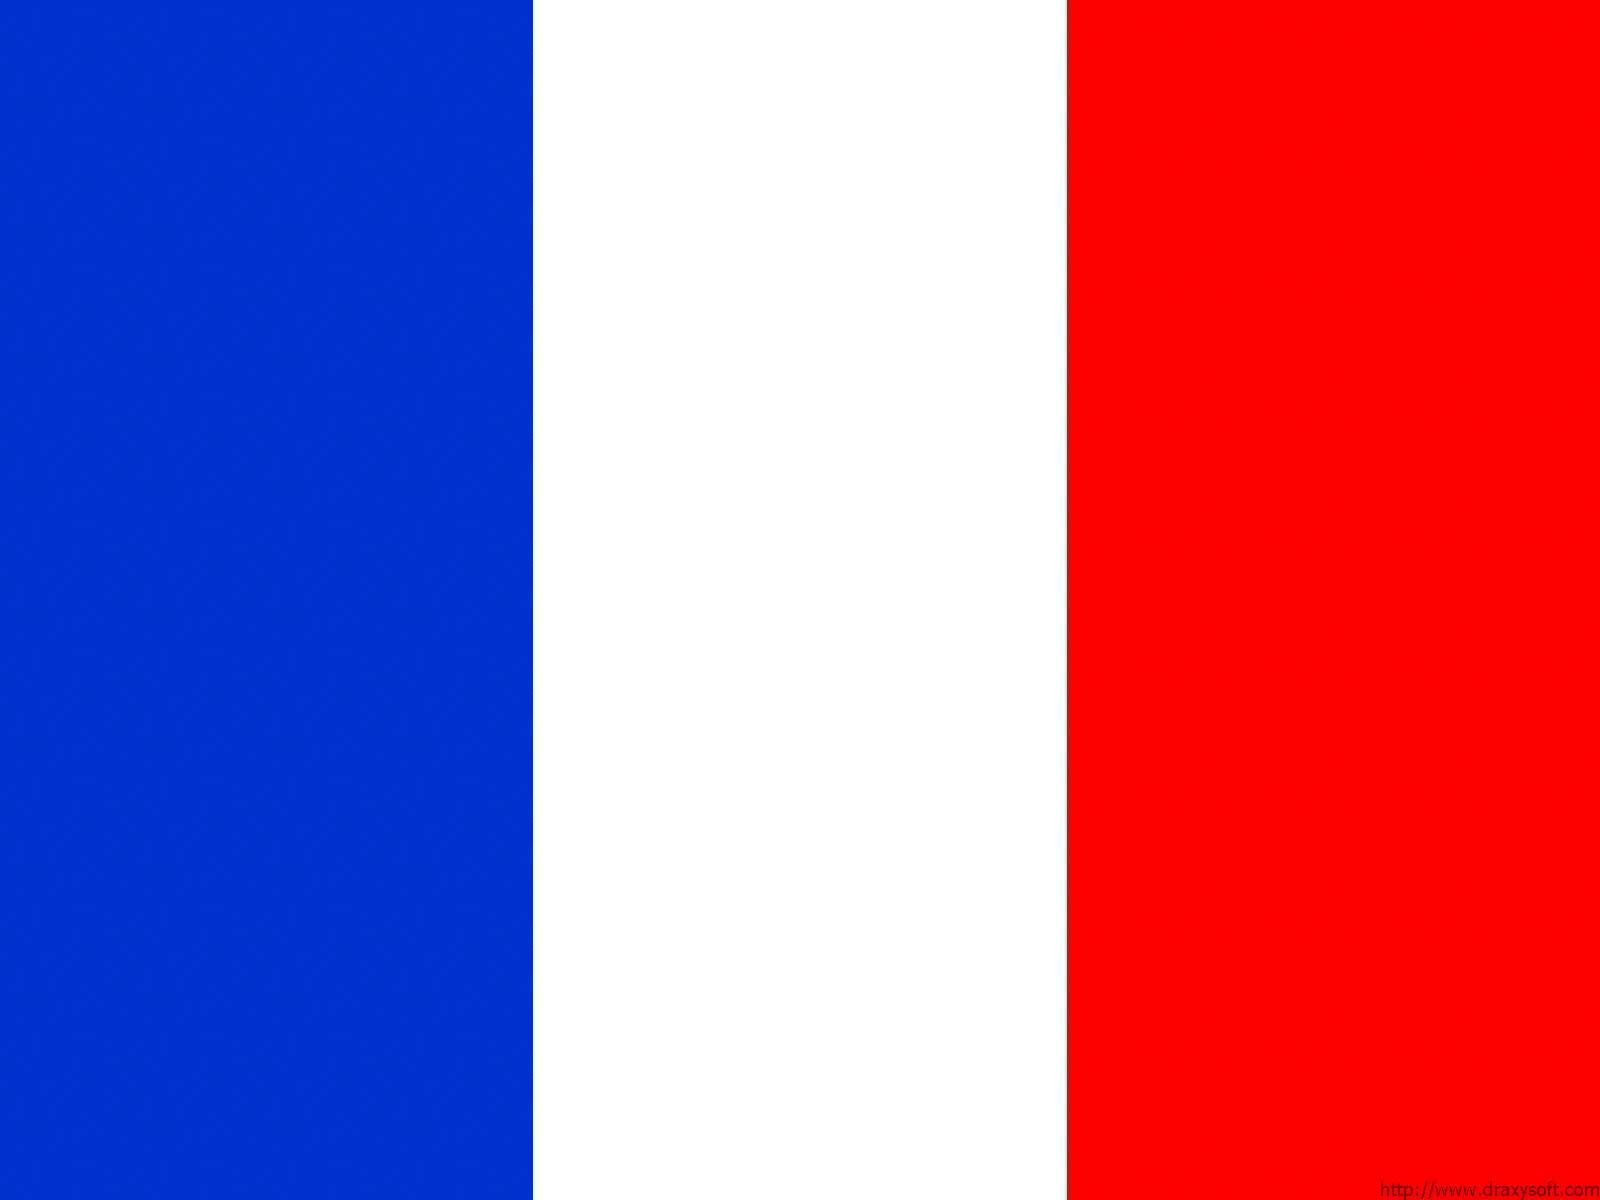 Chemical-Free France Pool Builder Flag